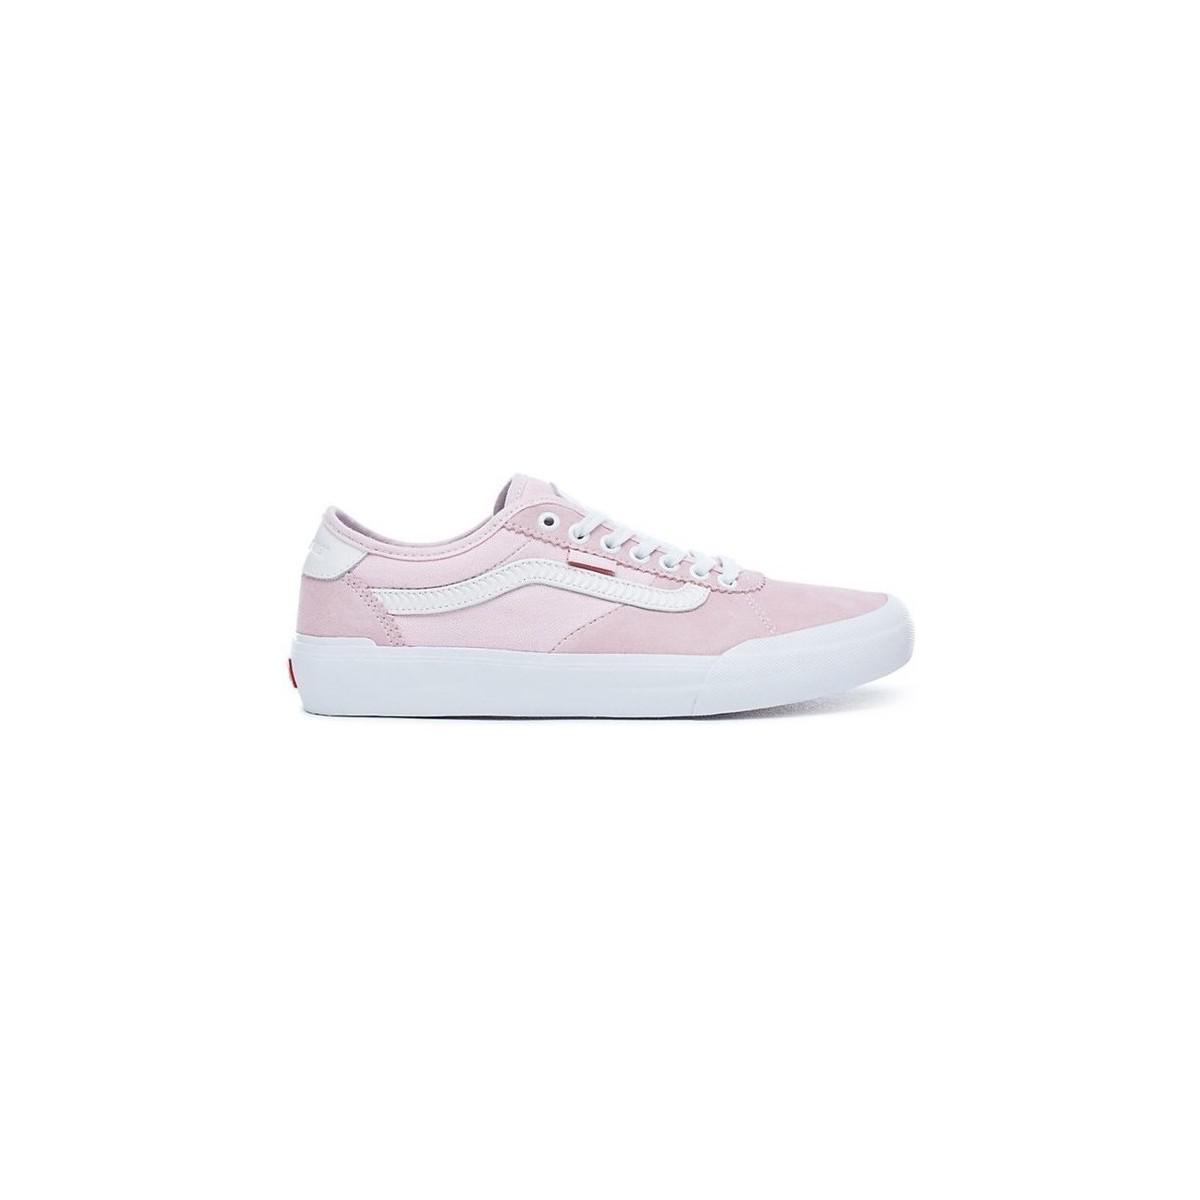 Vans X Spitfire Chima Pro Ii Rosa & Weiß Skate Schuhe Herren